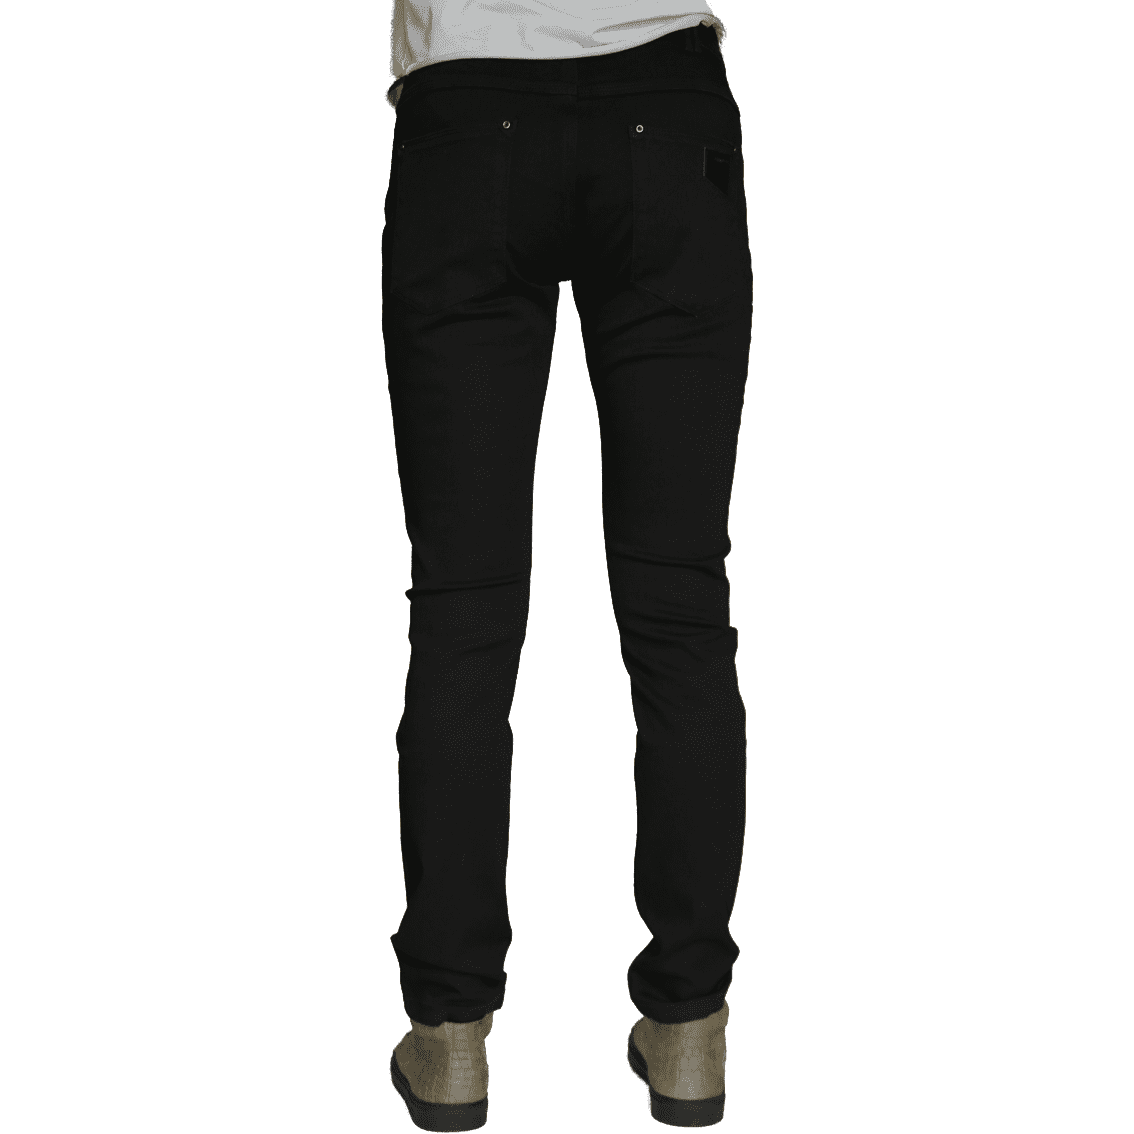 Cabinero Stiles Berlin Jeans Johnny Love, schwarz Herrenhosen 2017 2